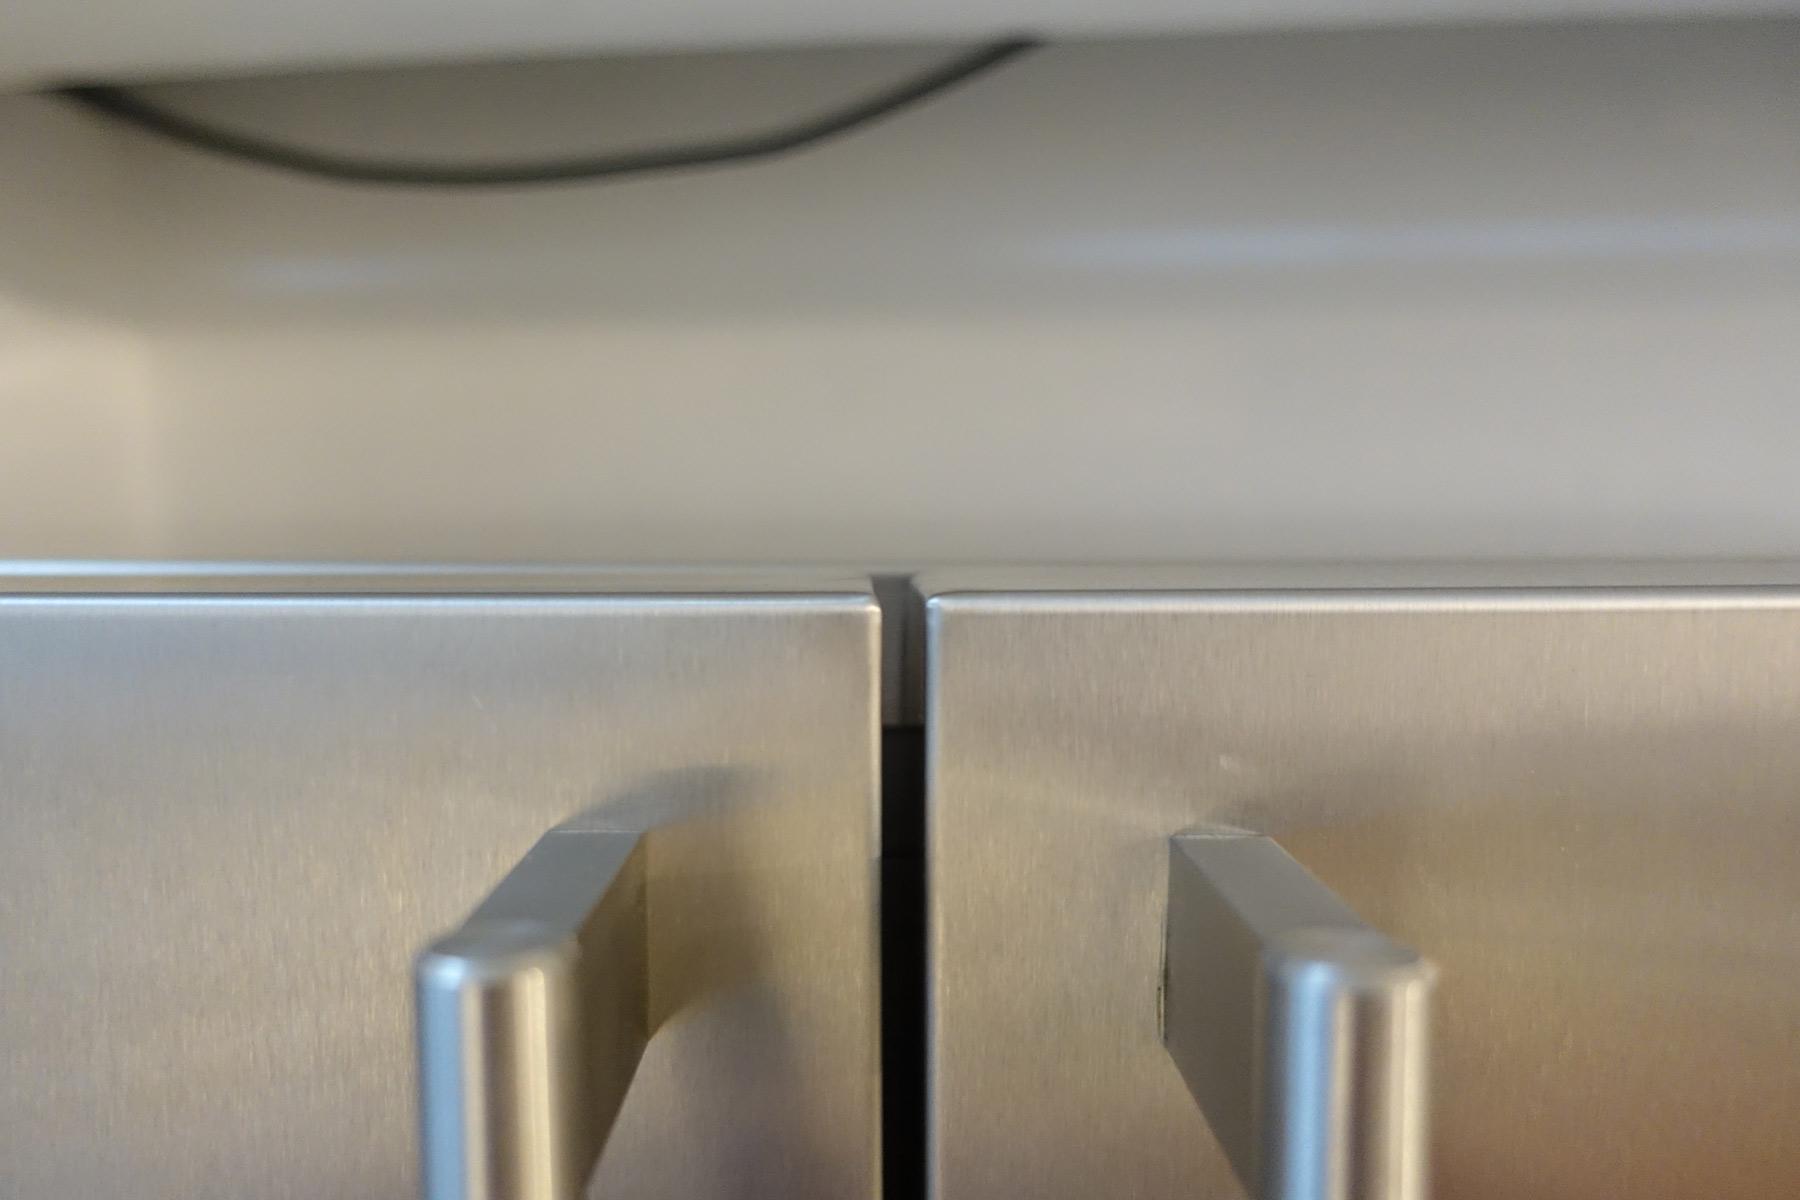 Side By Side Kühlschrank Real : O f classic side by side kühlschrank mit dispenser welter & welter